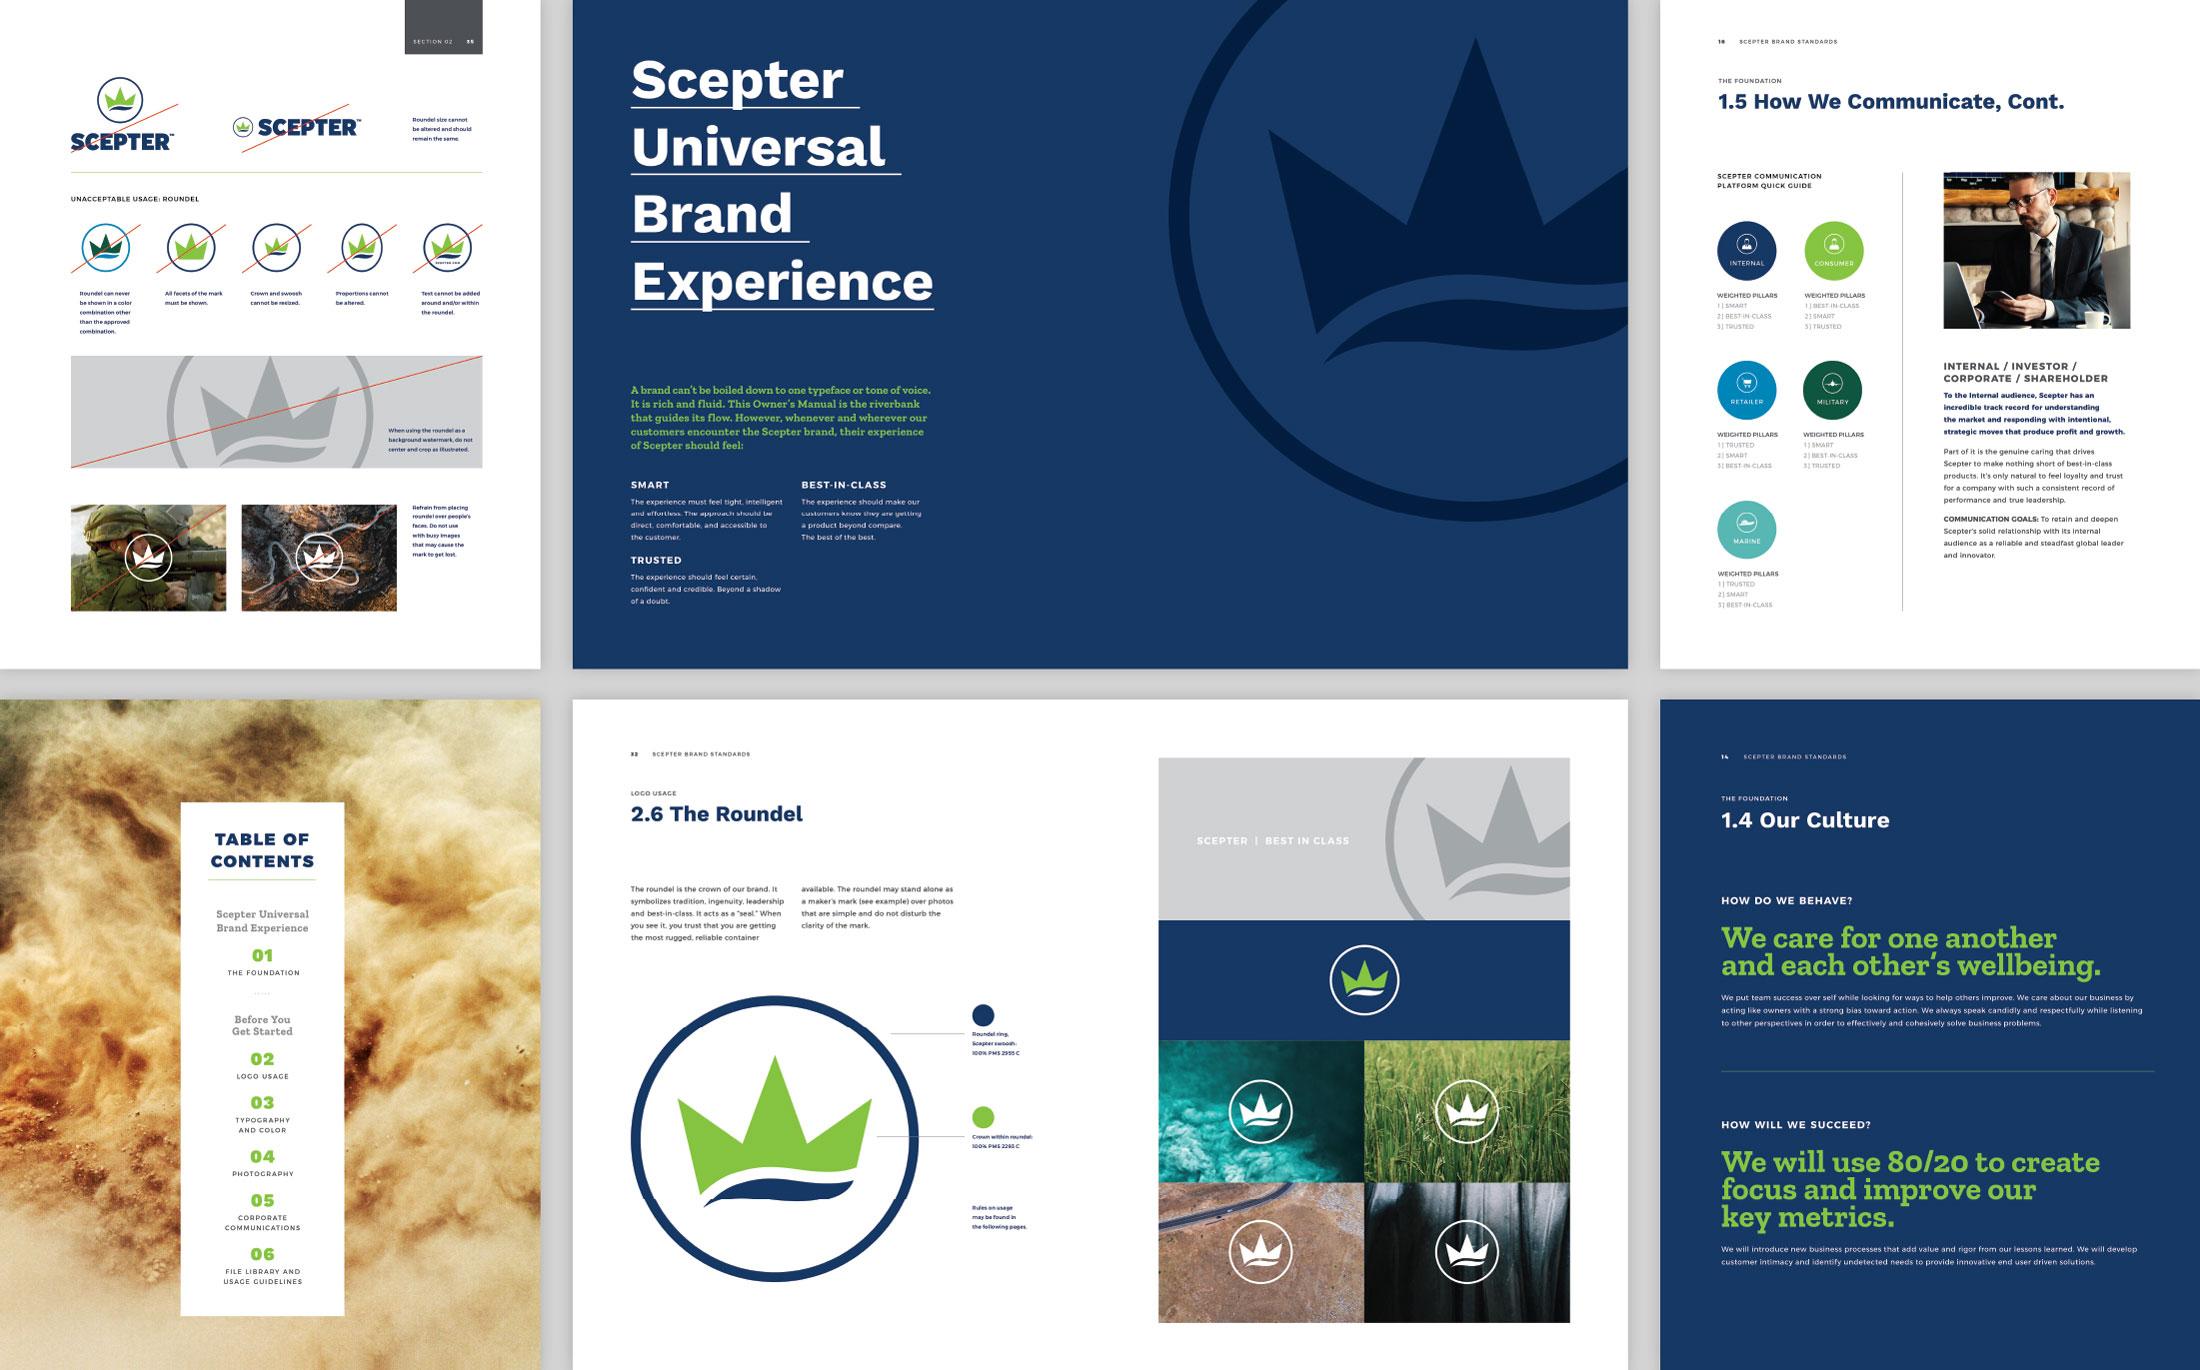 Scepter Brand Standards